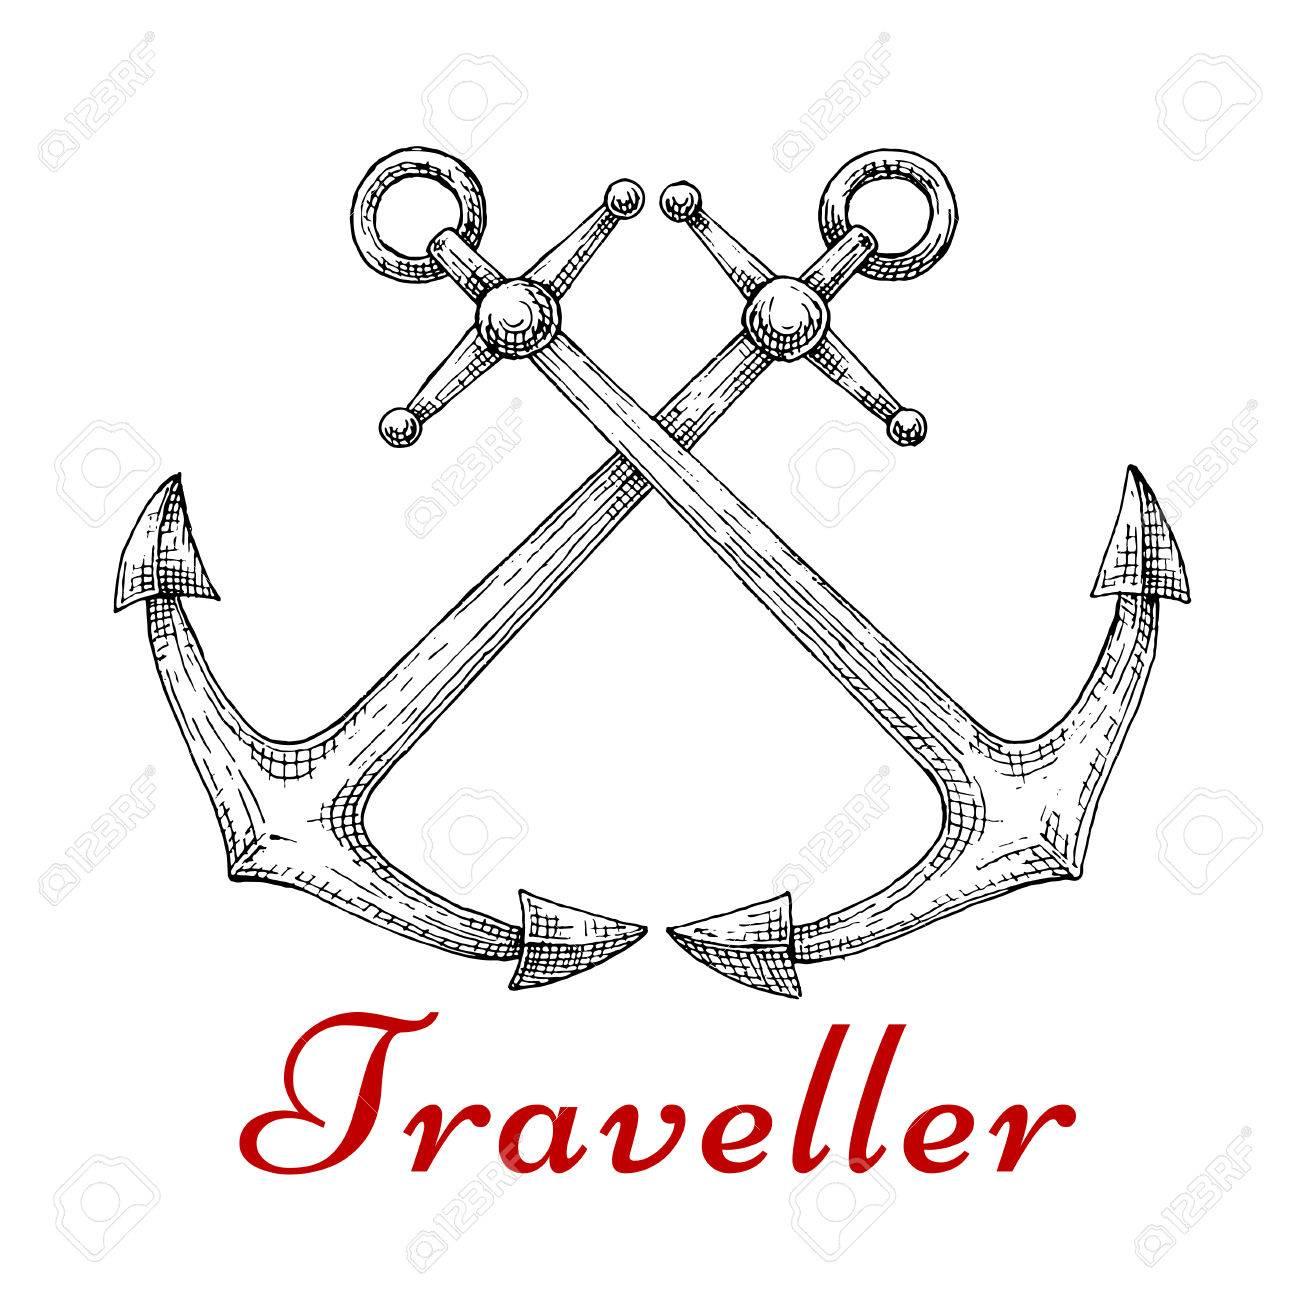 Marine traveler symbol with crossed old fashioned nautical anchors marine traveler symbol with crossed old fashioned nautical anchors sketch style may be used buycottarizona